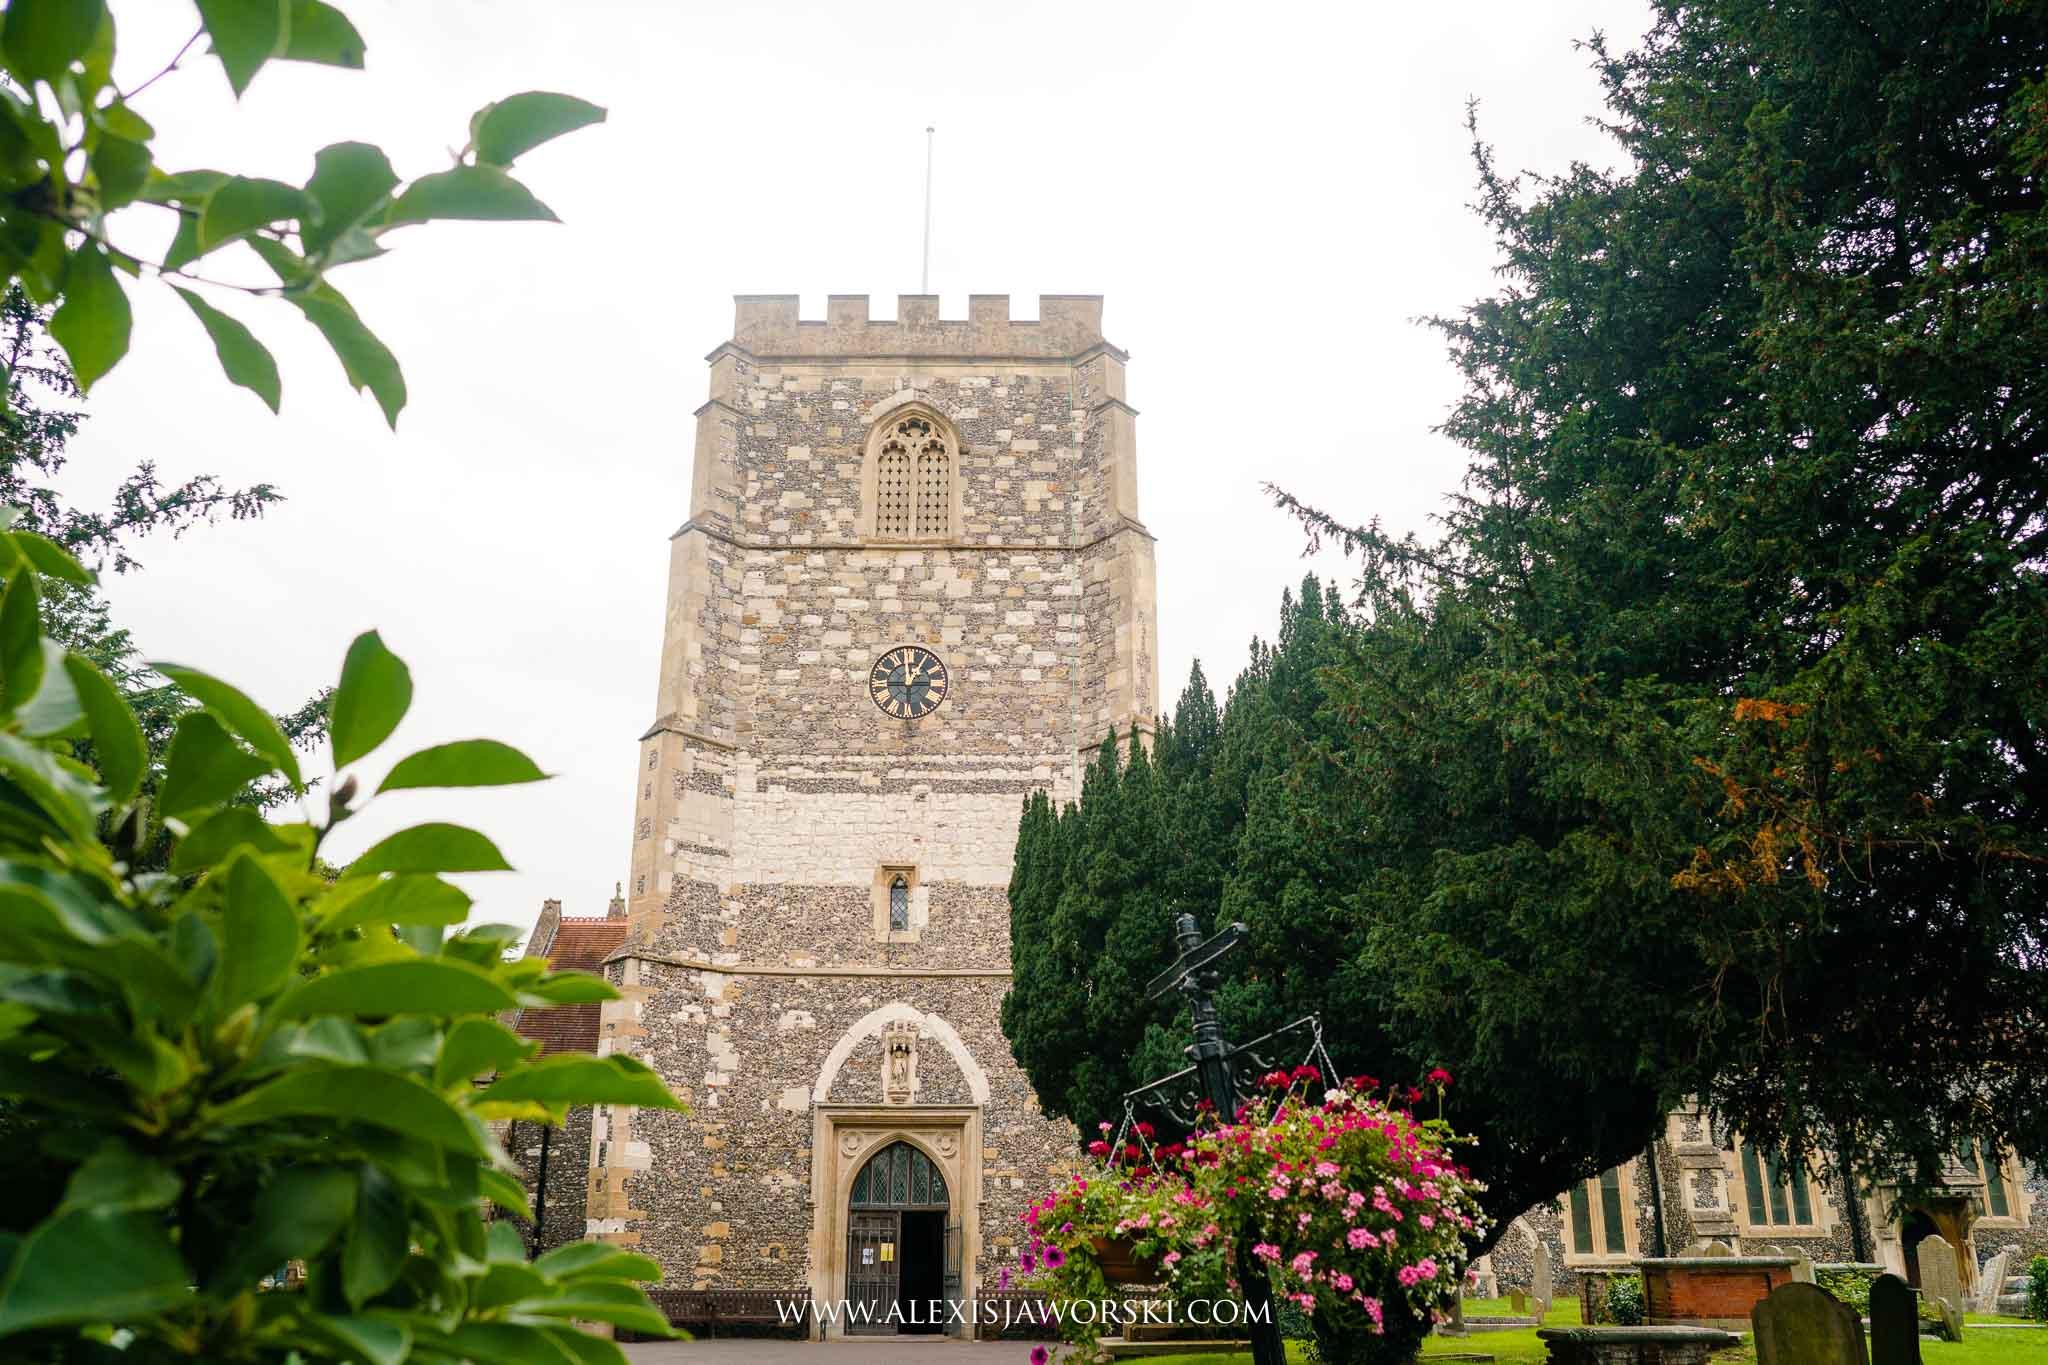 St. Michaels Church in Bray